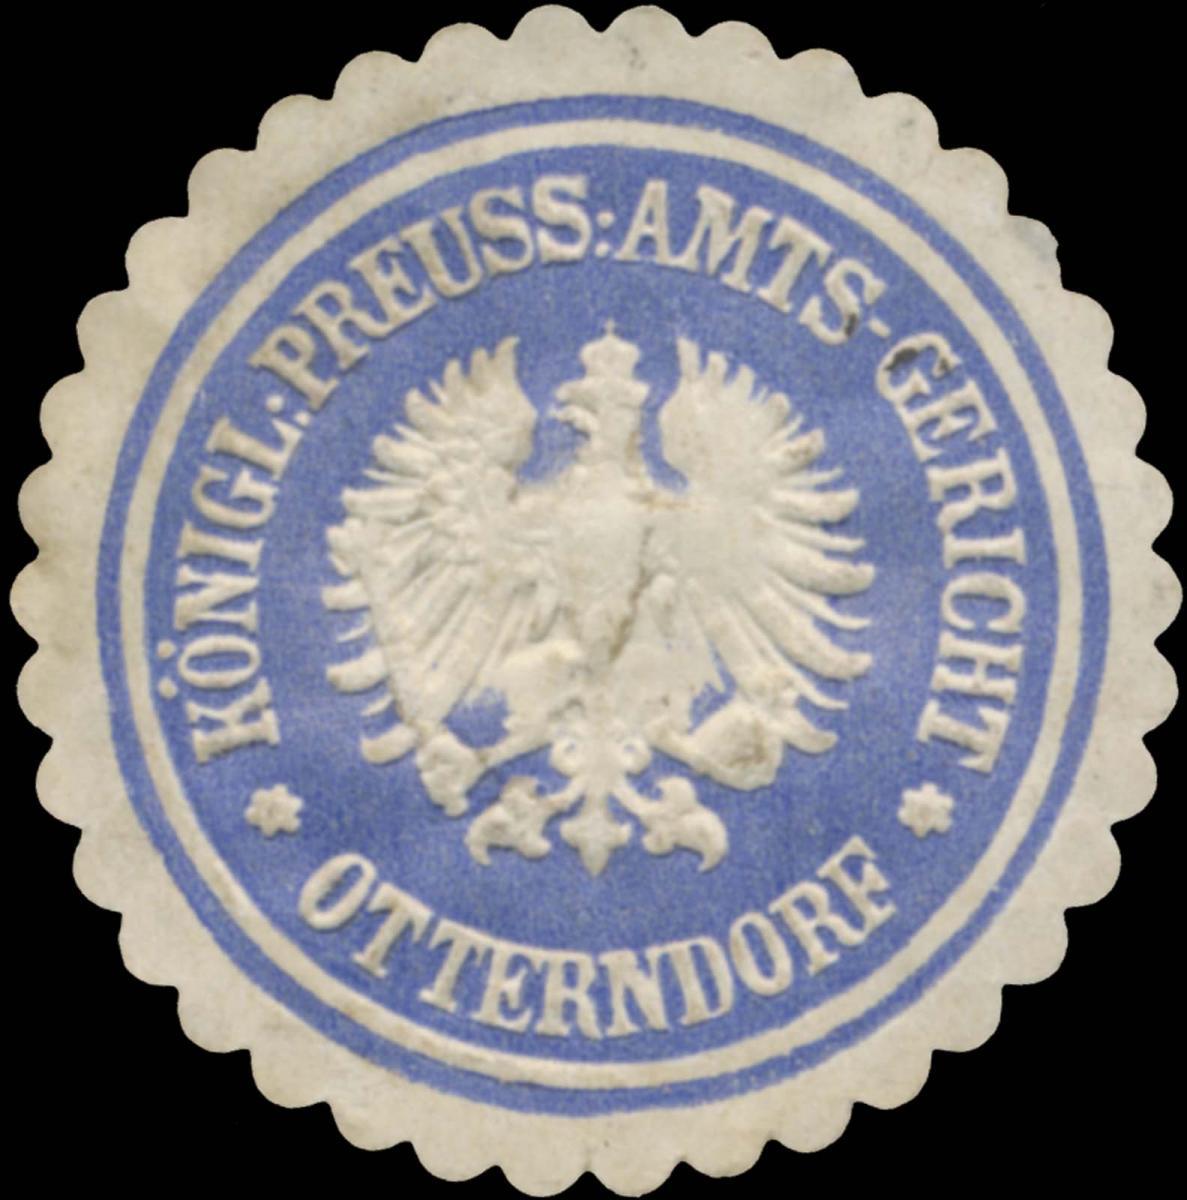 K.Pr. Amtsgericht Otterndorf 0